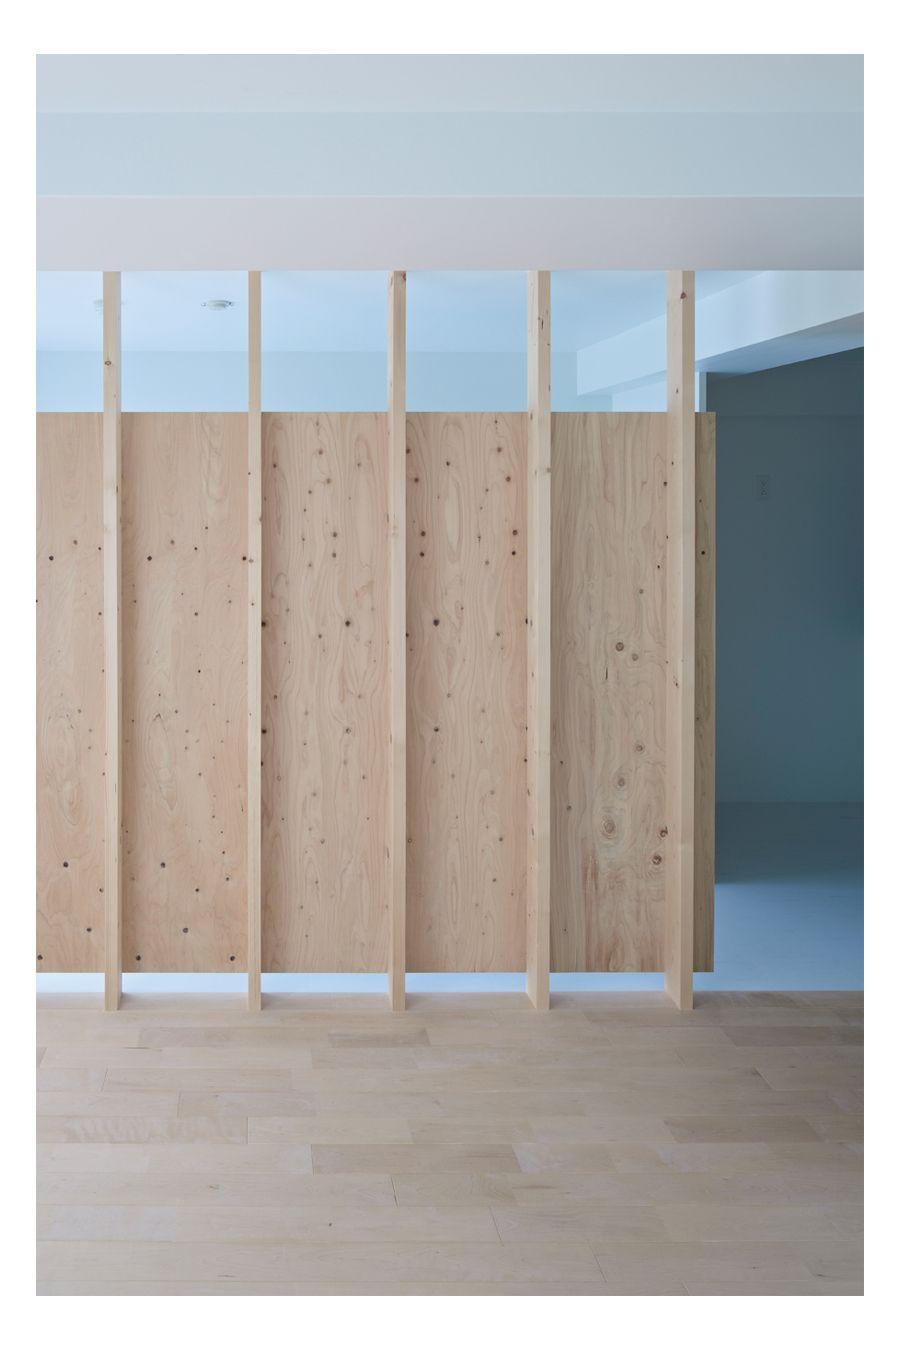 Renovation in muromi 室見のリノベーション de dividir pinterest